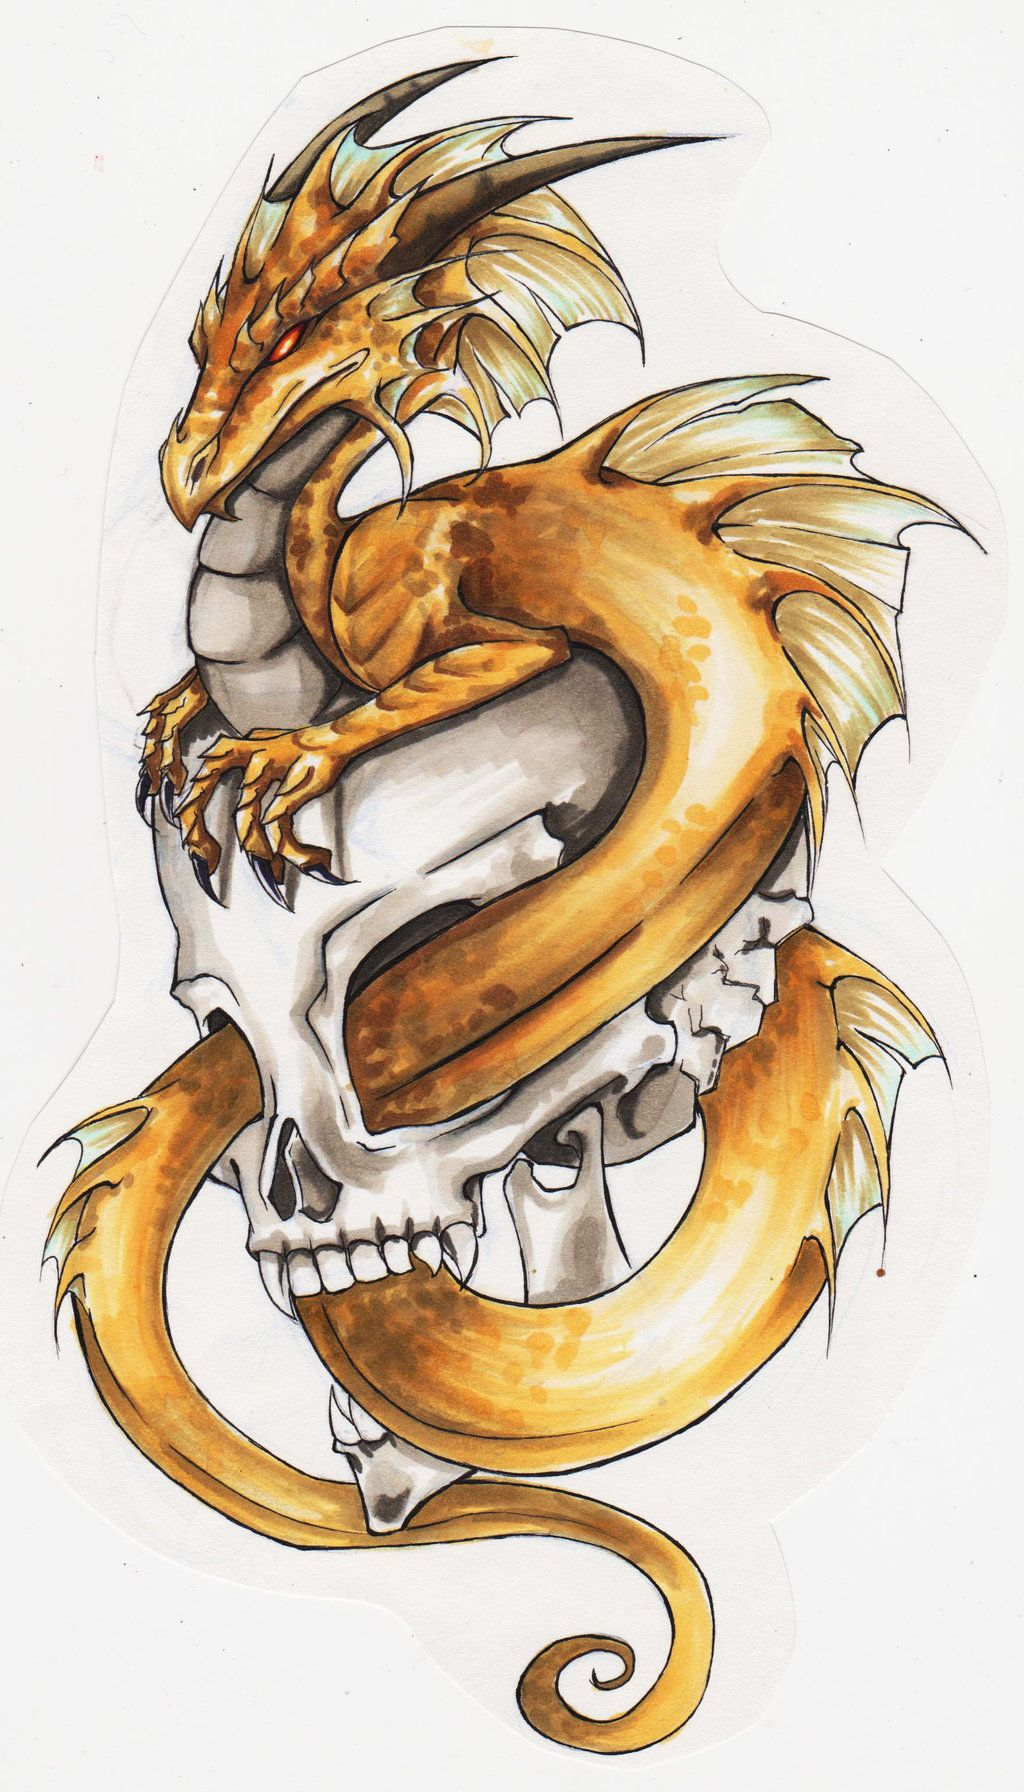 50 dragon tattoos designs